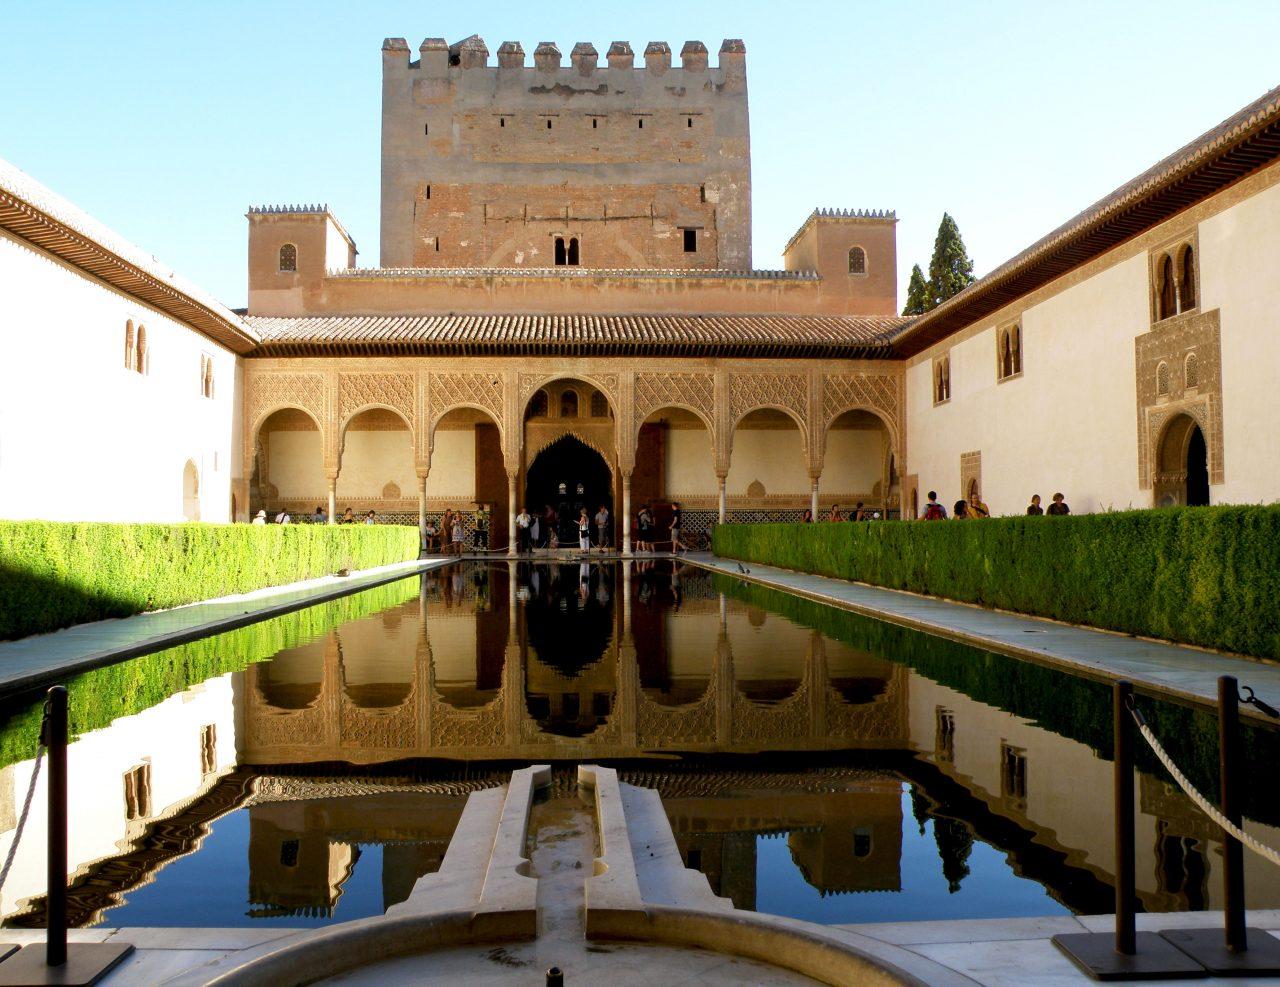 Ivana-Dukčević-Granada-mavarska-Palata-Alhambra-XIII-v-1280x987.jpg